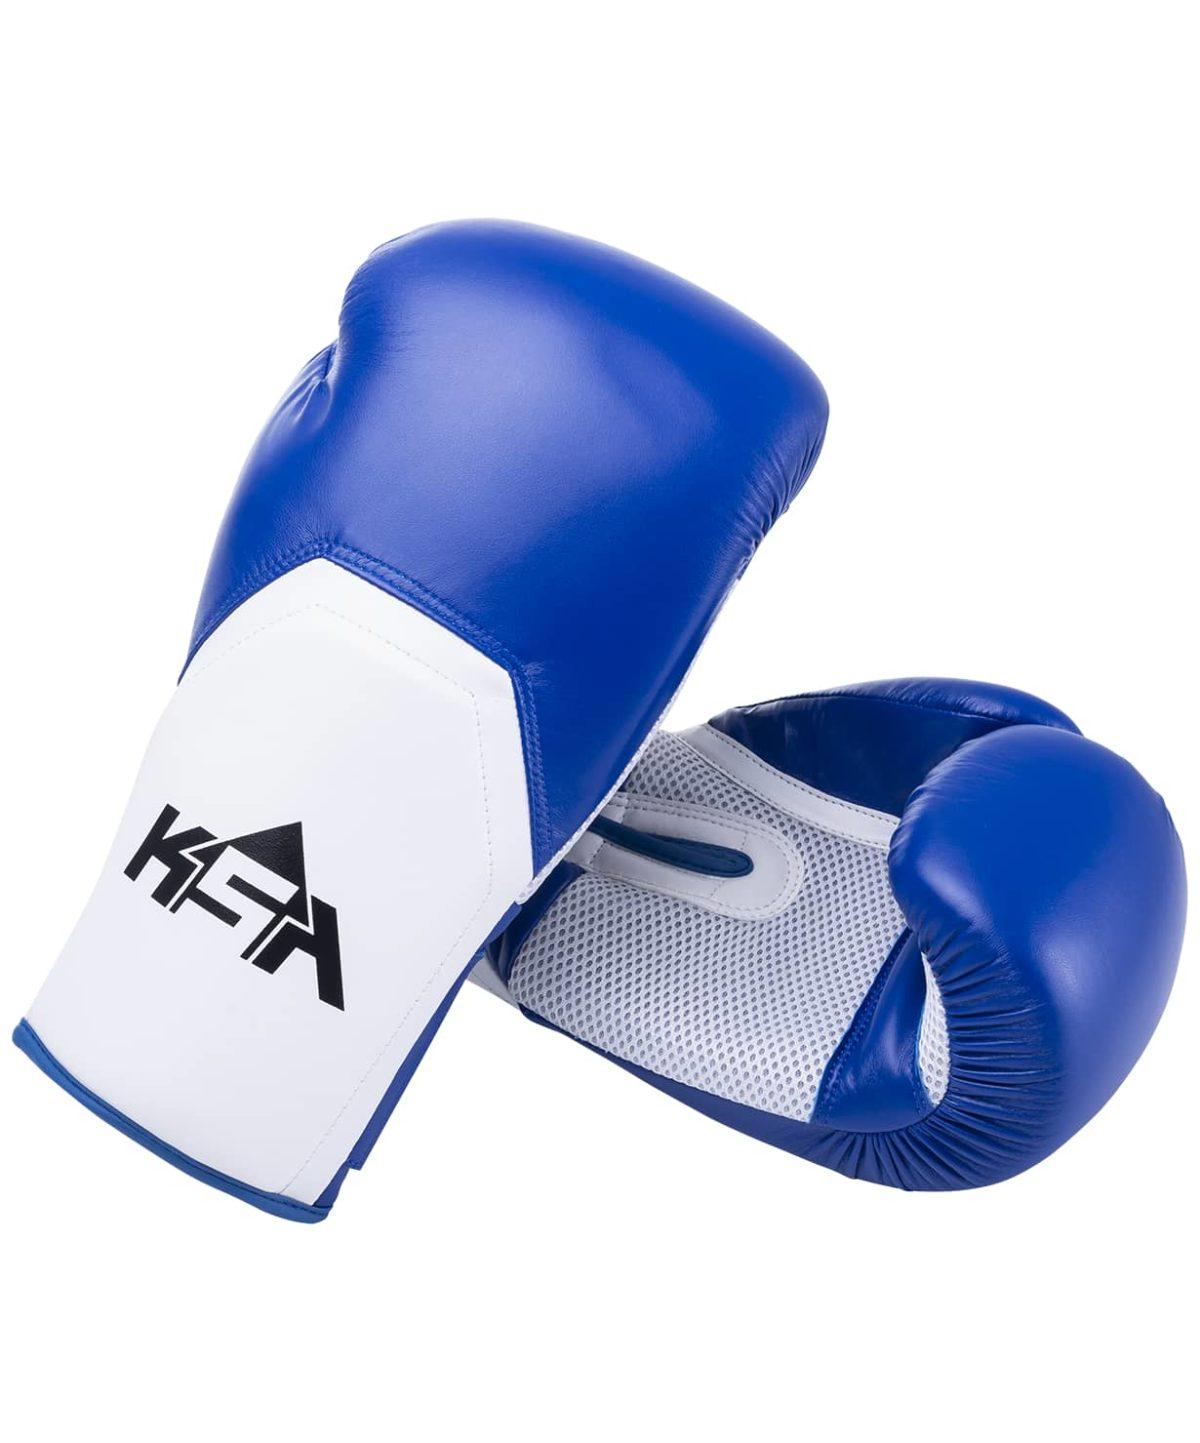 KSA Scorpio Blue Перчатки боксерские, 8 oz, к/з  17817 - 1